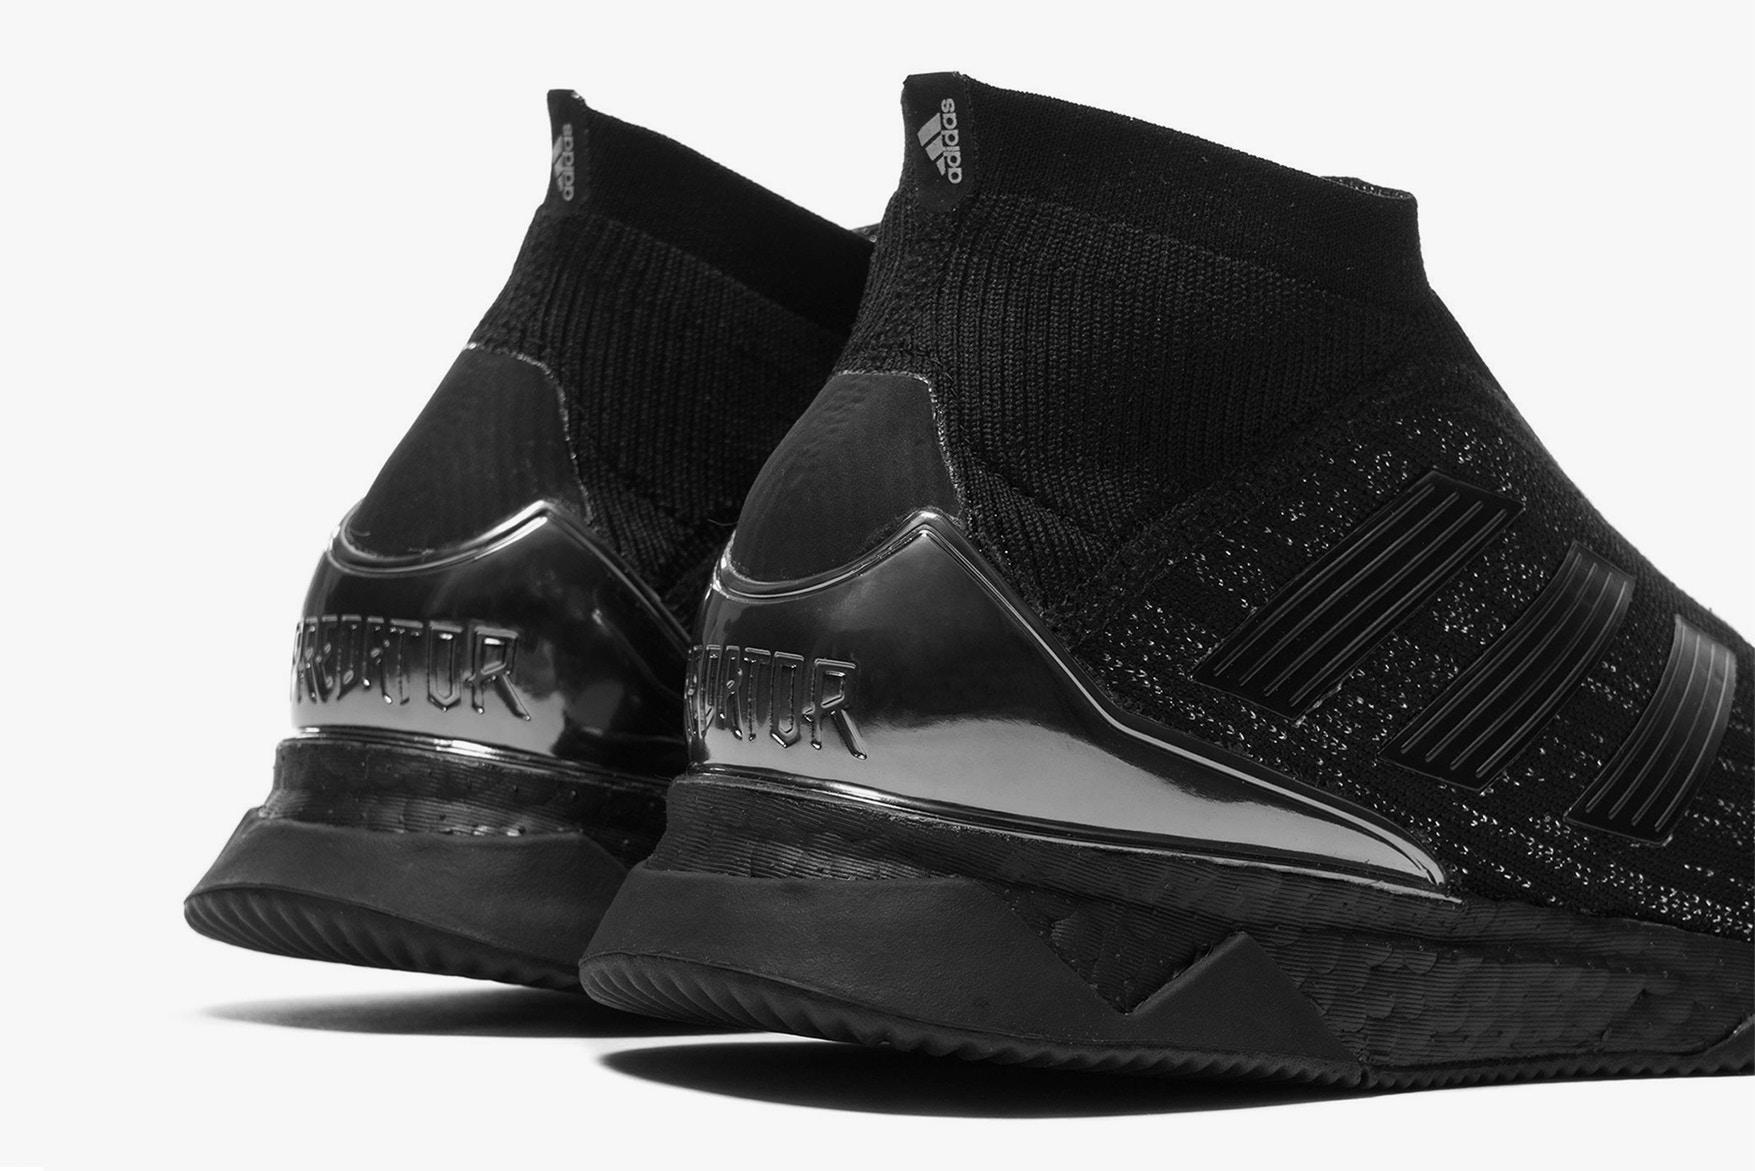 adidas-predator-tango-18-black-silver-release-info-04